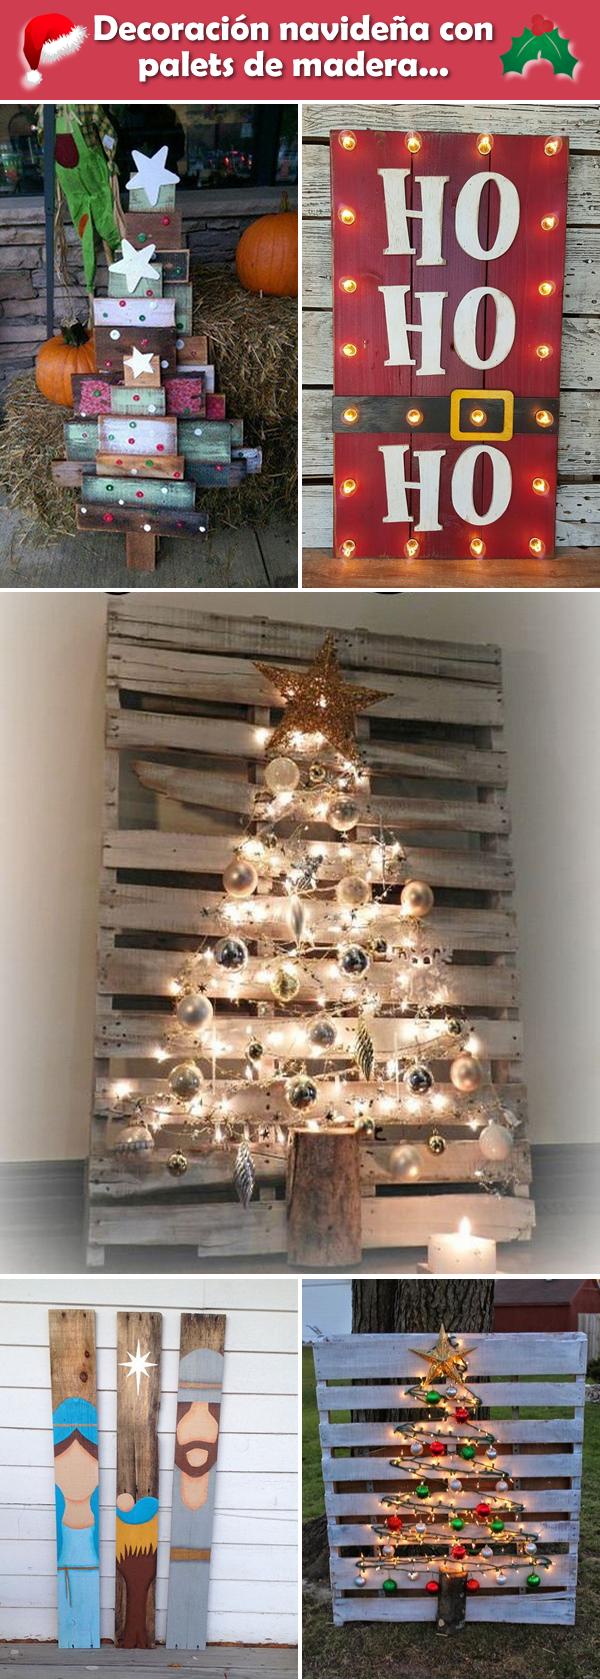 Decoraci n navide a con palets de madera tarimas de for Deco en palet de madera